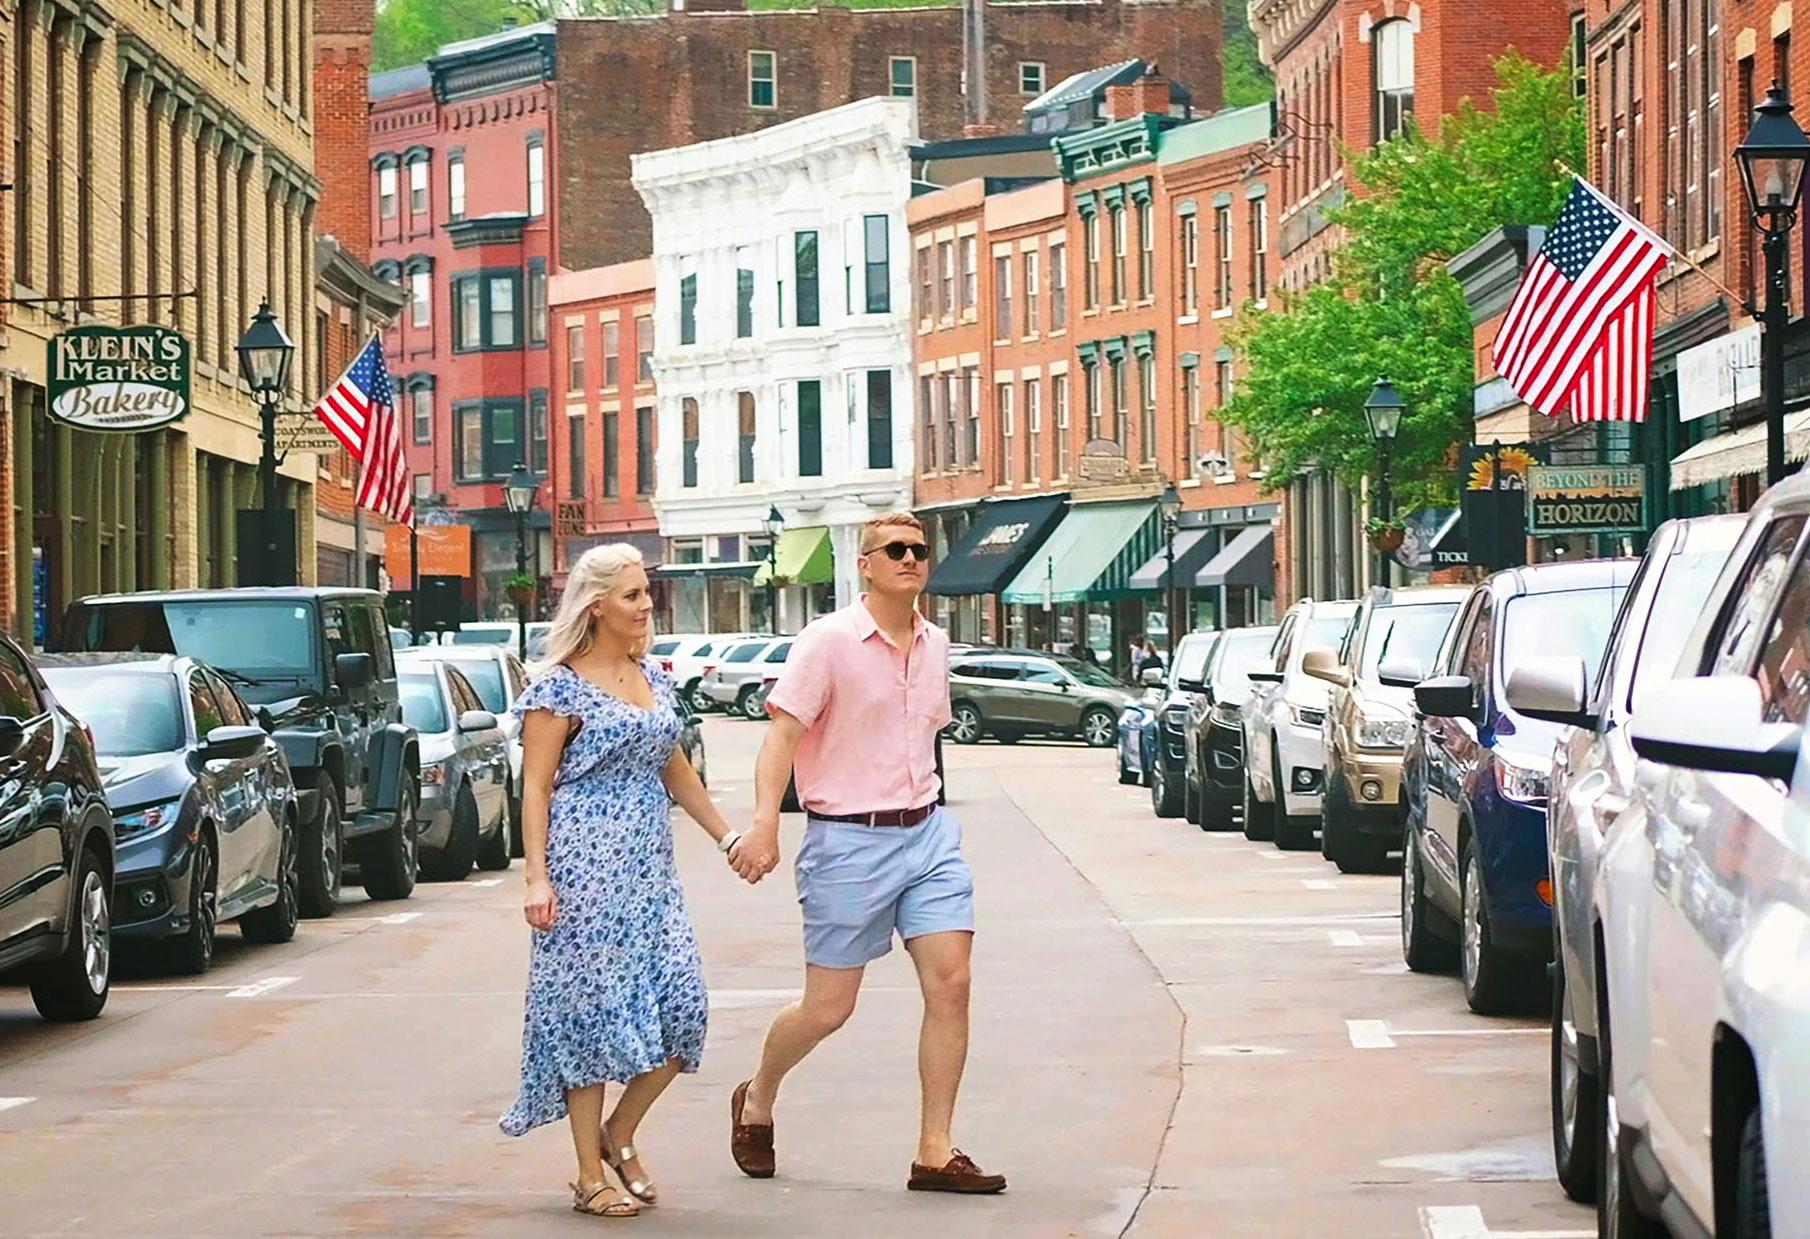 Main Street in Galena, Illinois